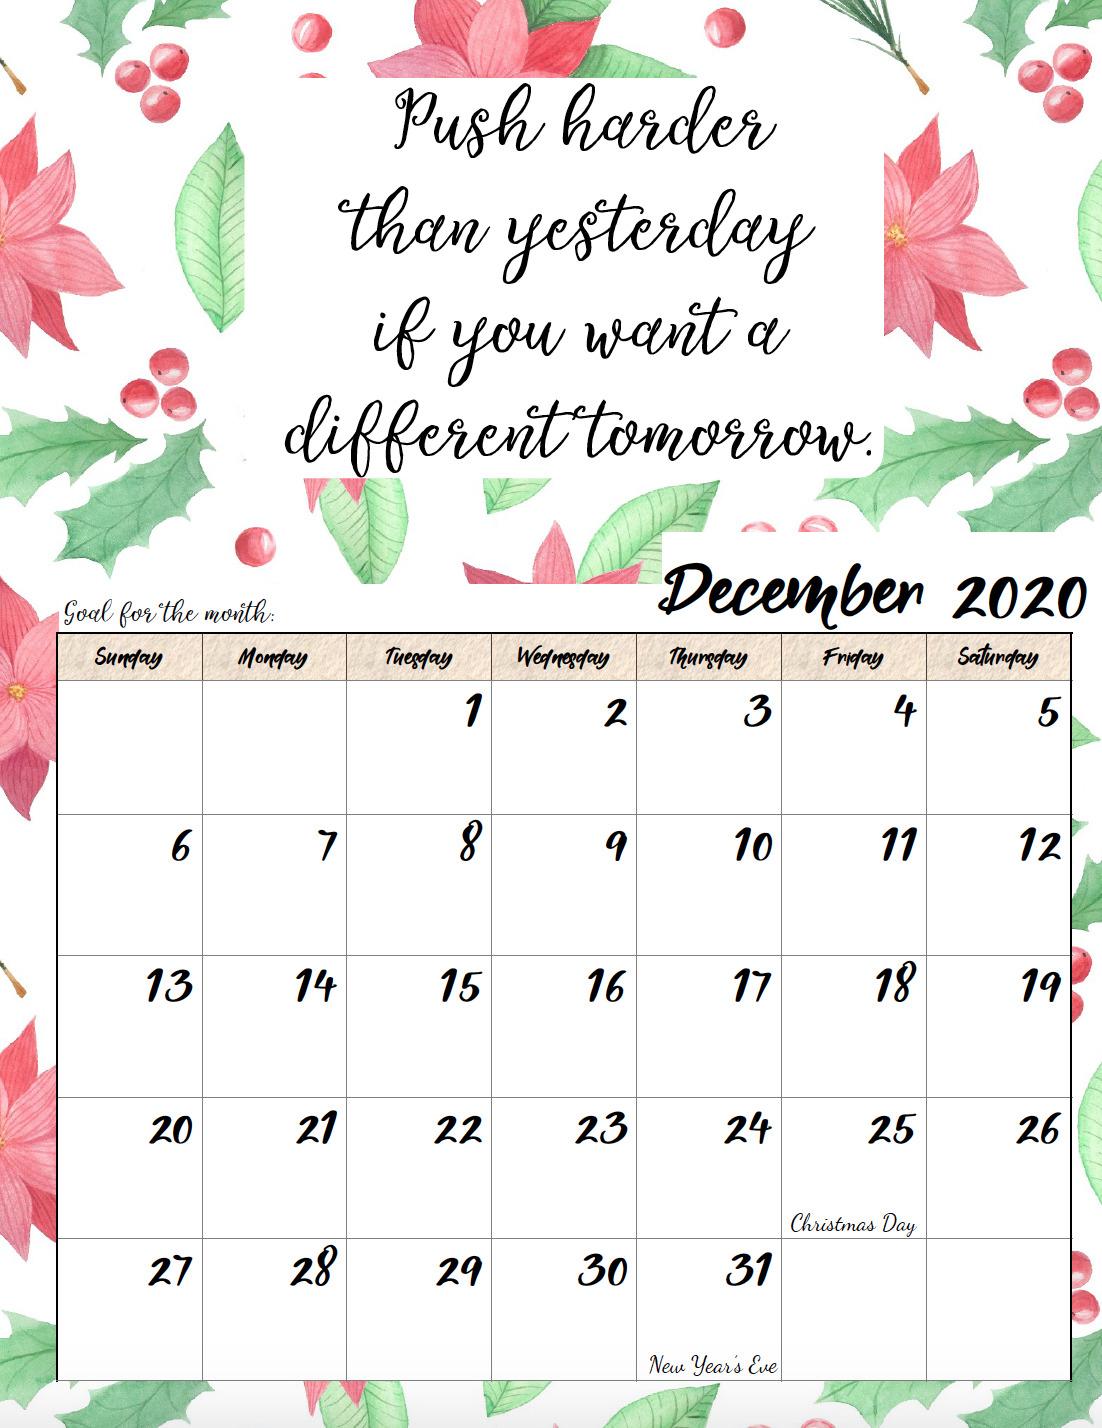 Free printable December 2020 monthly motivational calendar.